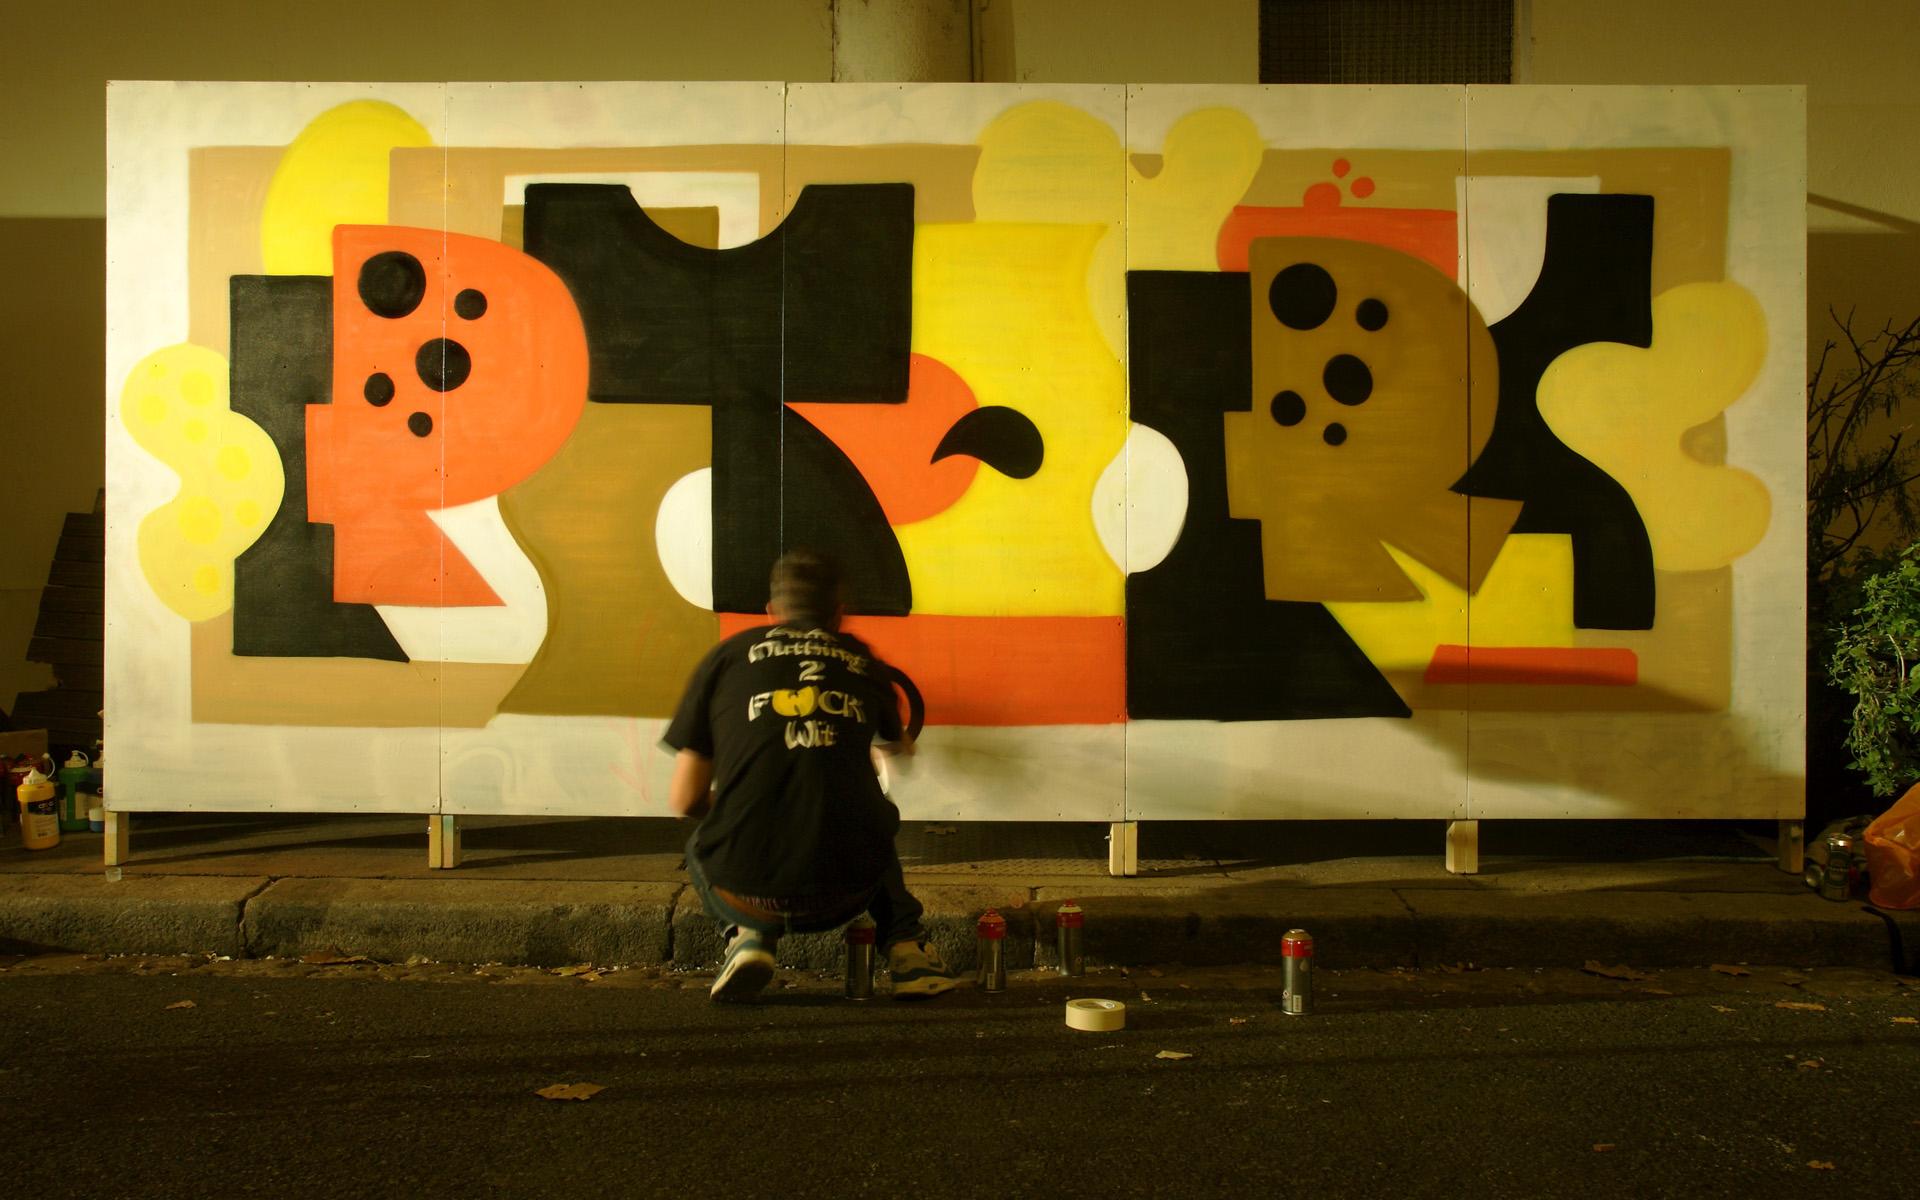 Graff-ik-Art-2015-12